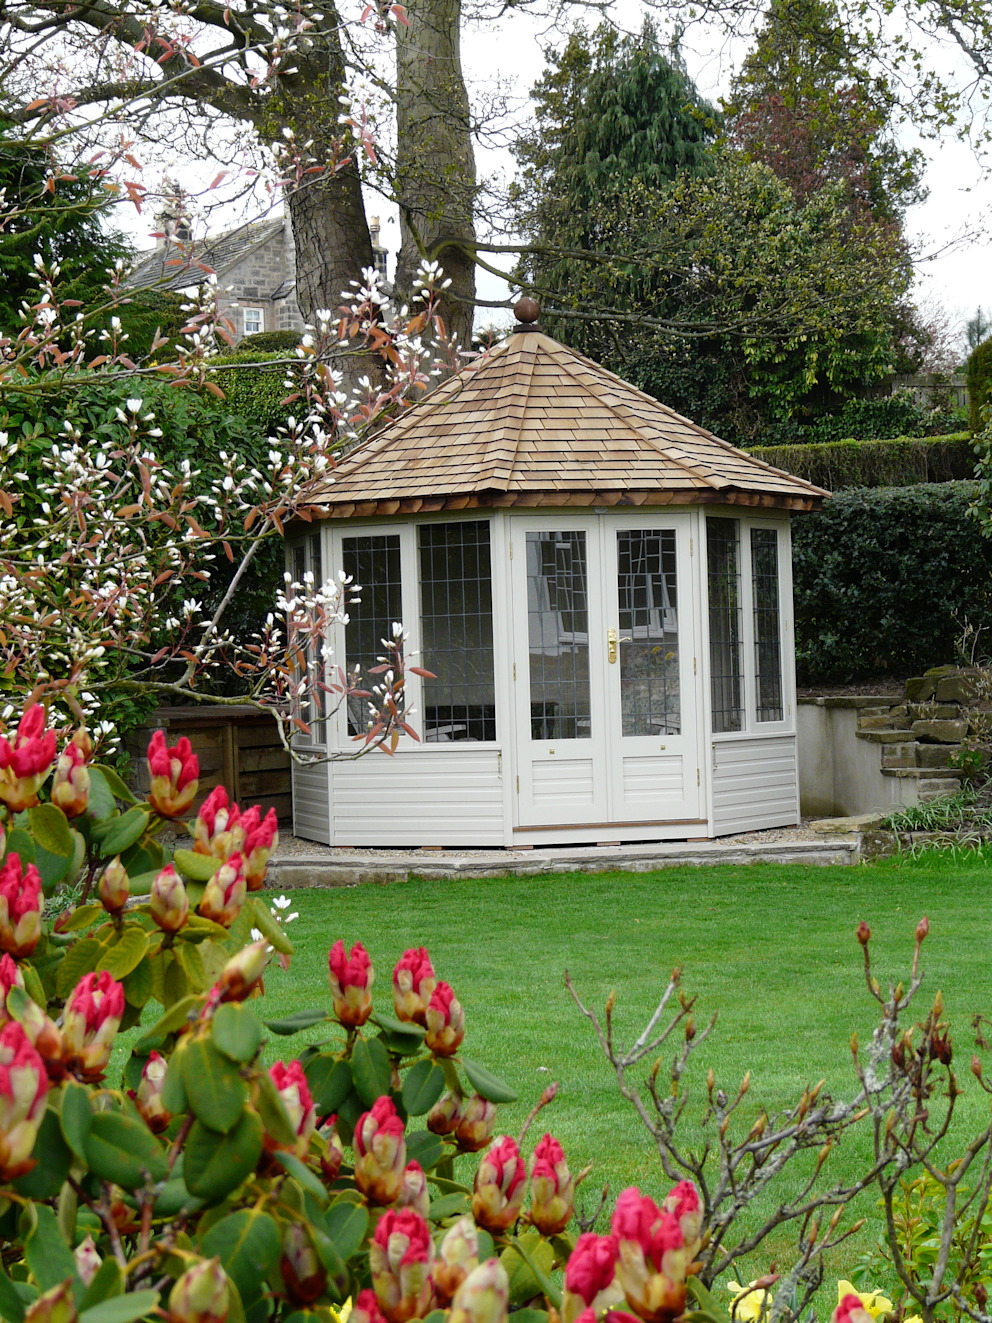 Thw Wraysbury Summerhouse Chelsea Summerhouses Ltd Classic style garden